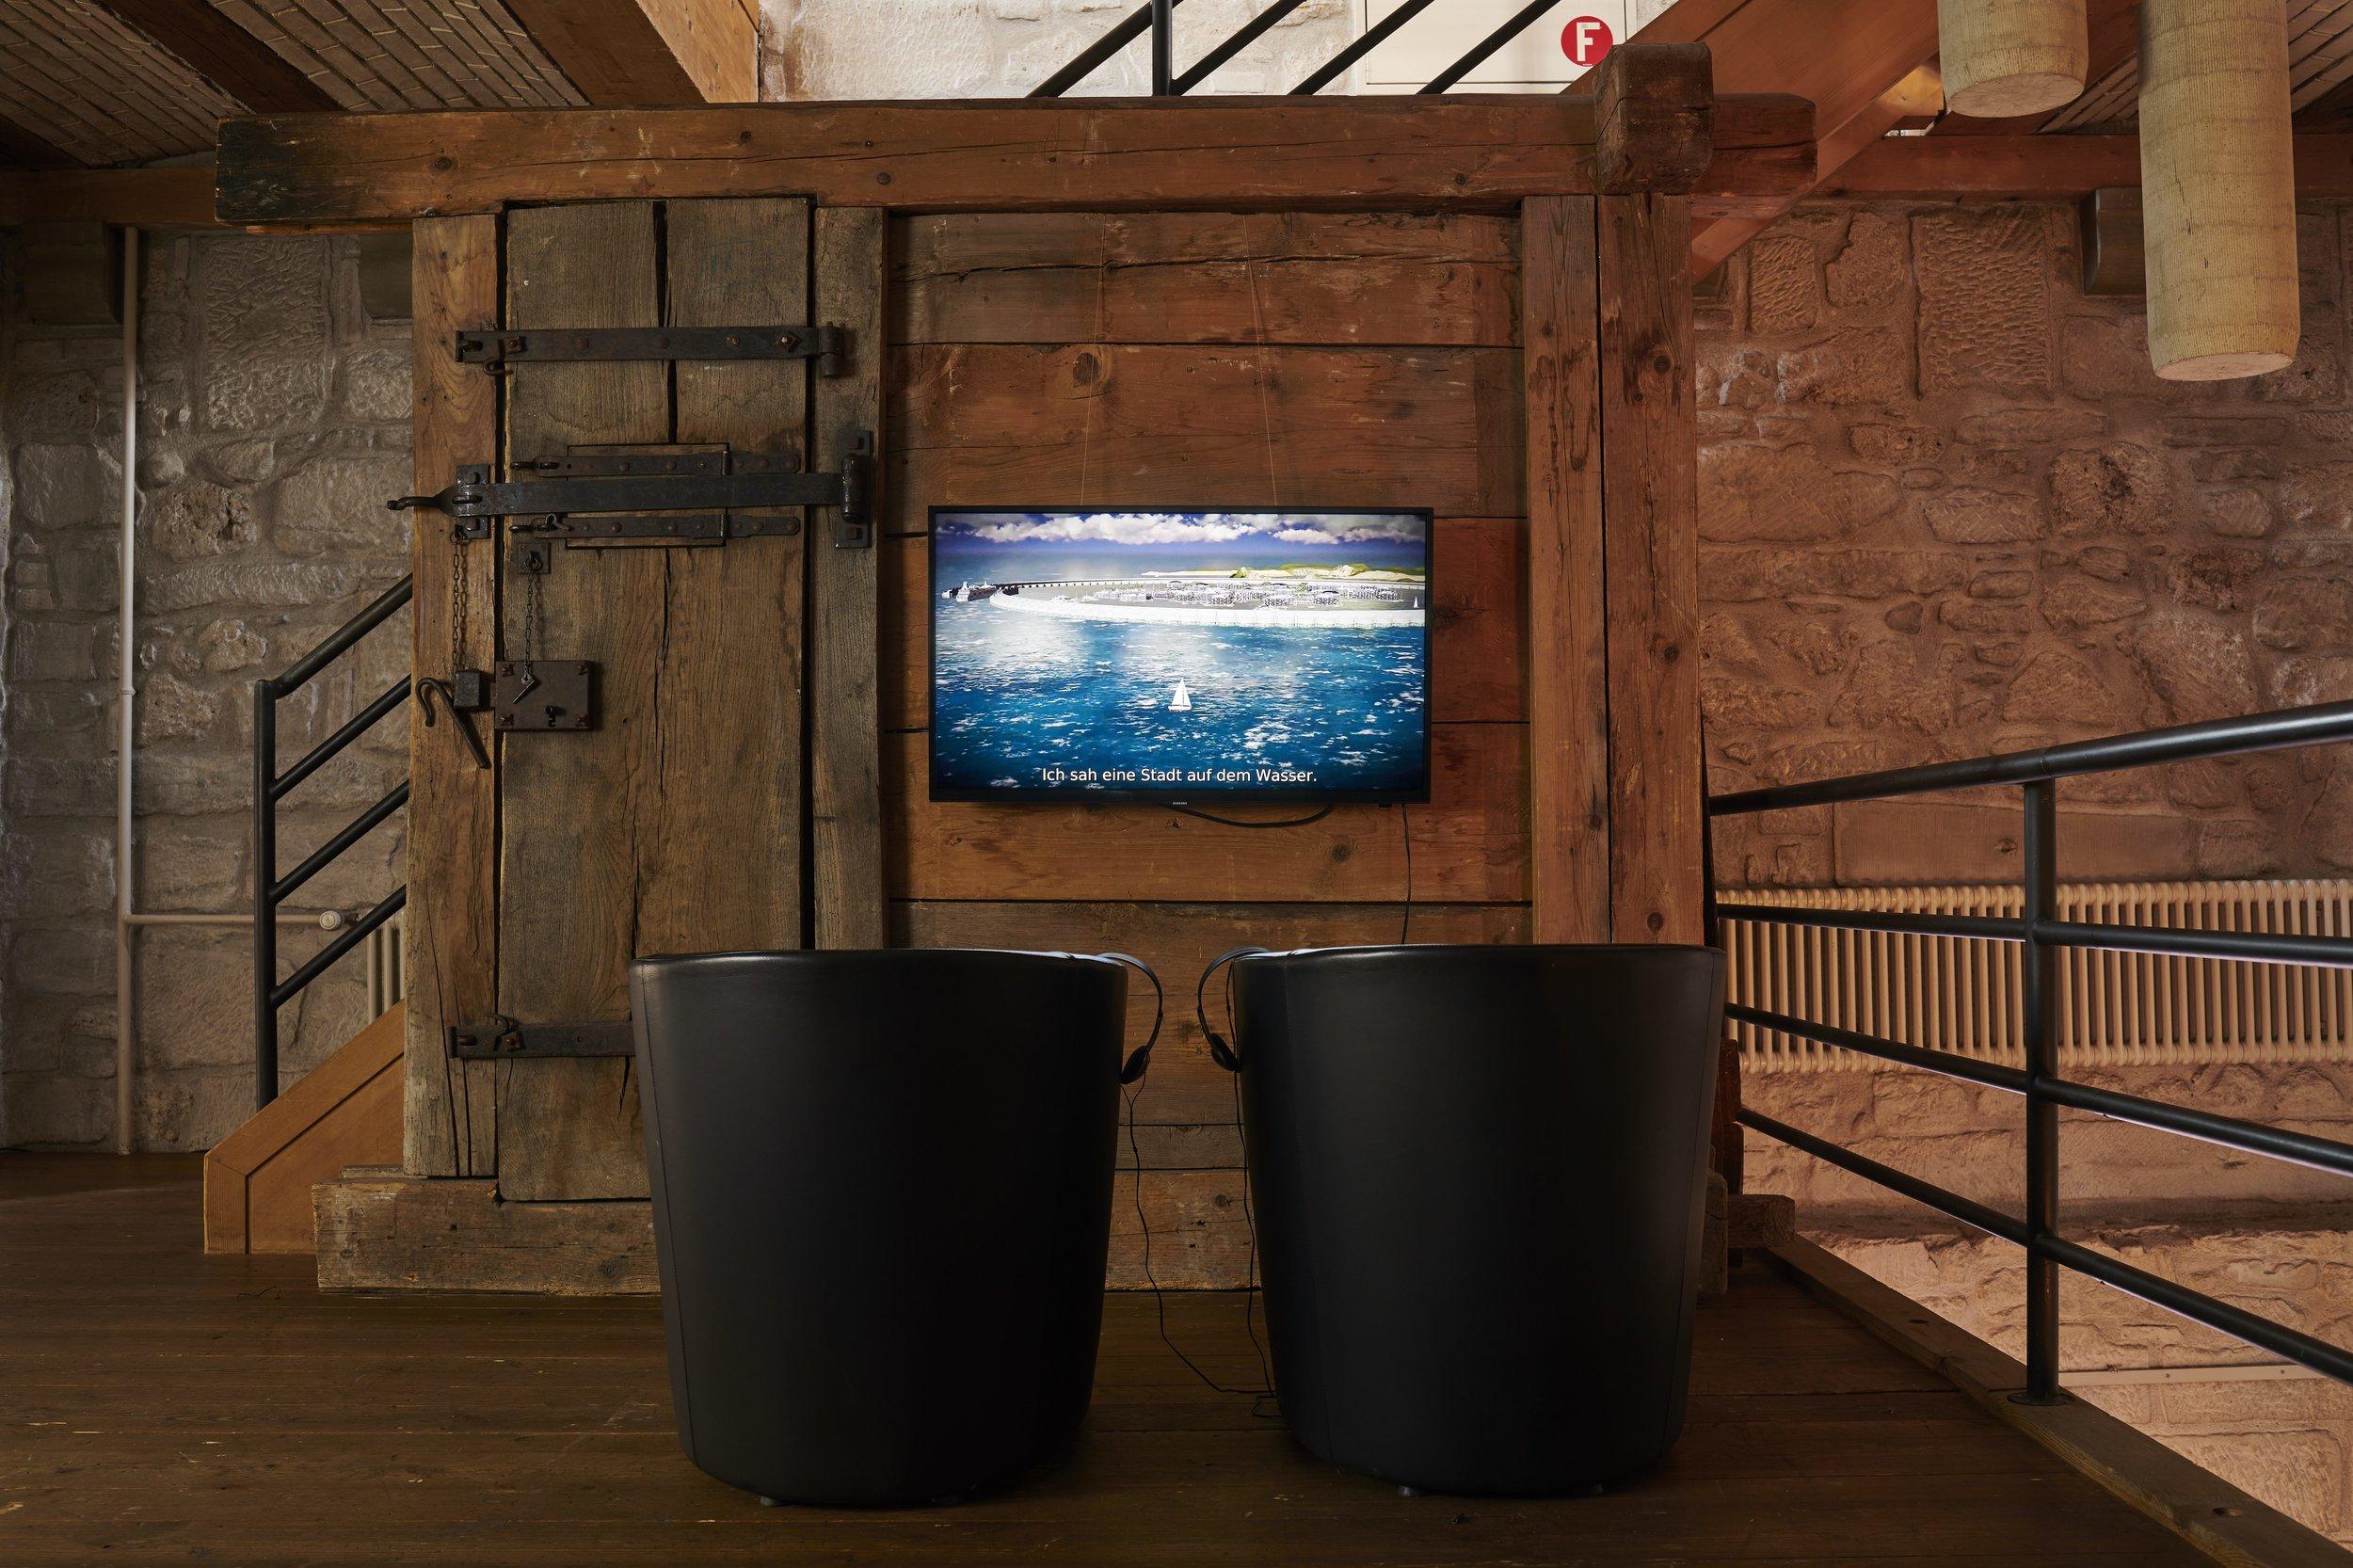 Jacob Hurwitz-Goodman & Daniel Keller,  The Seasteaders , 2018, HD Video, 27 min, Ausstellungsansicht